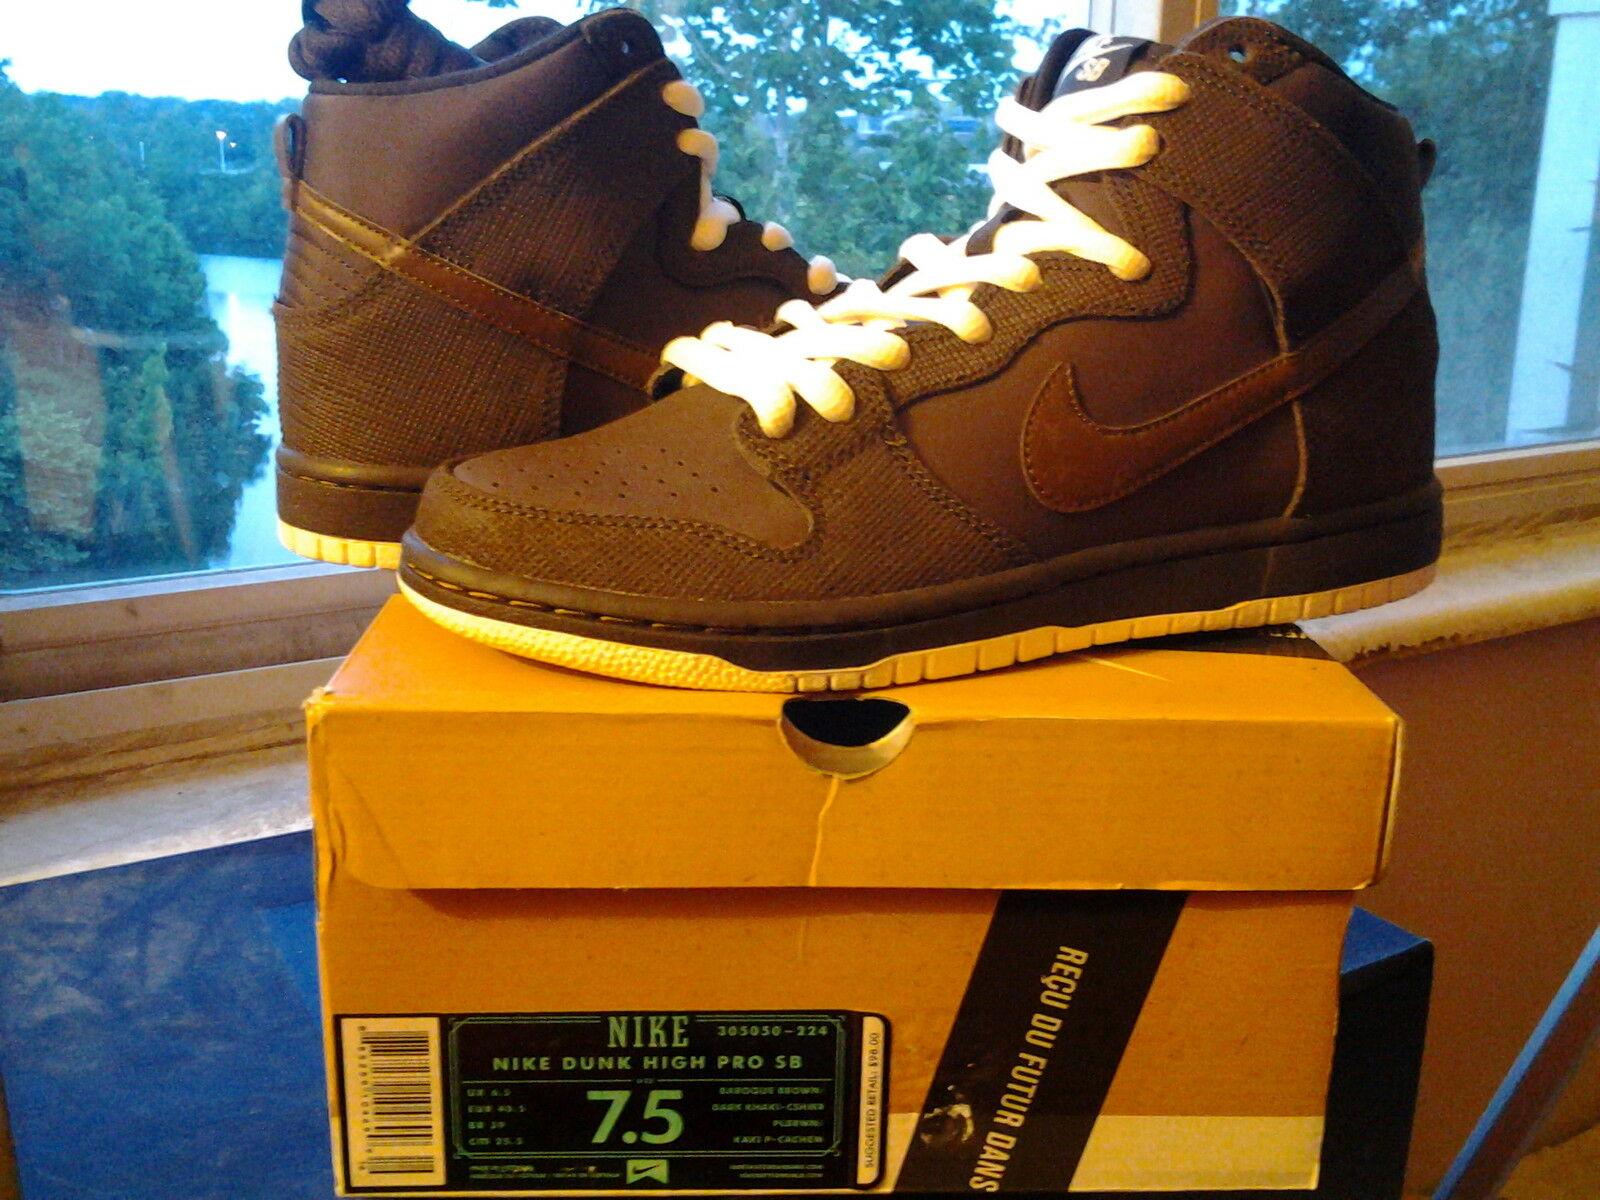 Comfortable and good-looking Nike Dunk High Pro SB Baroque Brown Dark Khaki Cashmir low mid force 305050 224